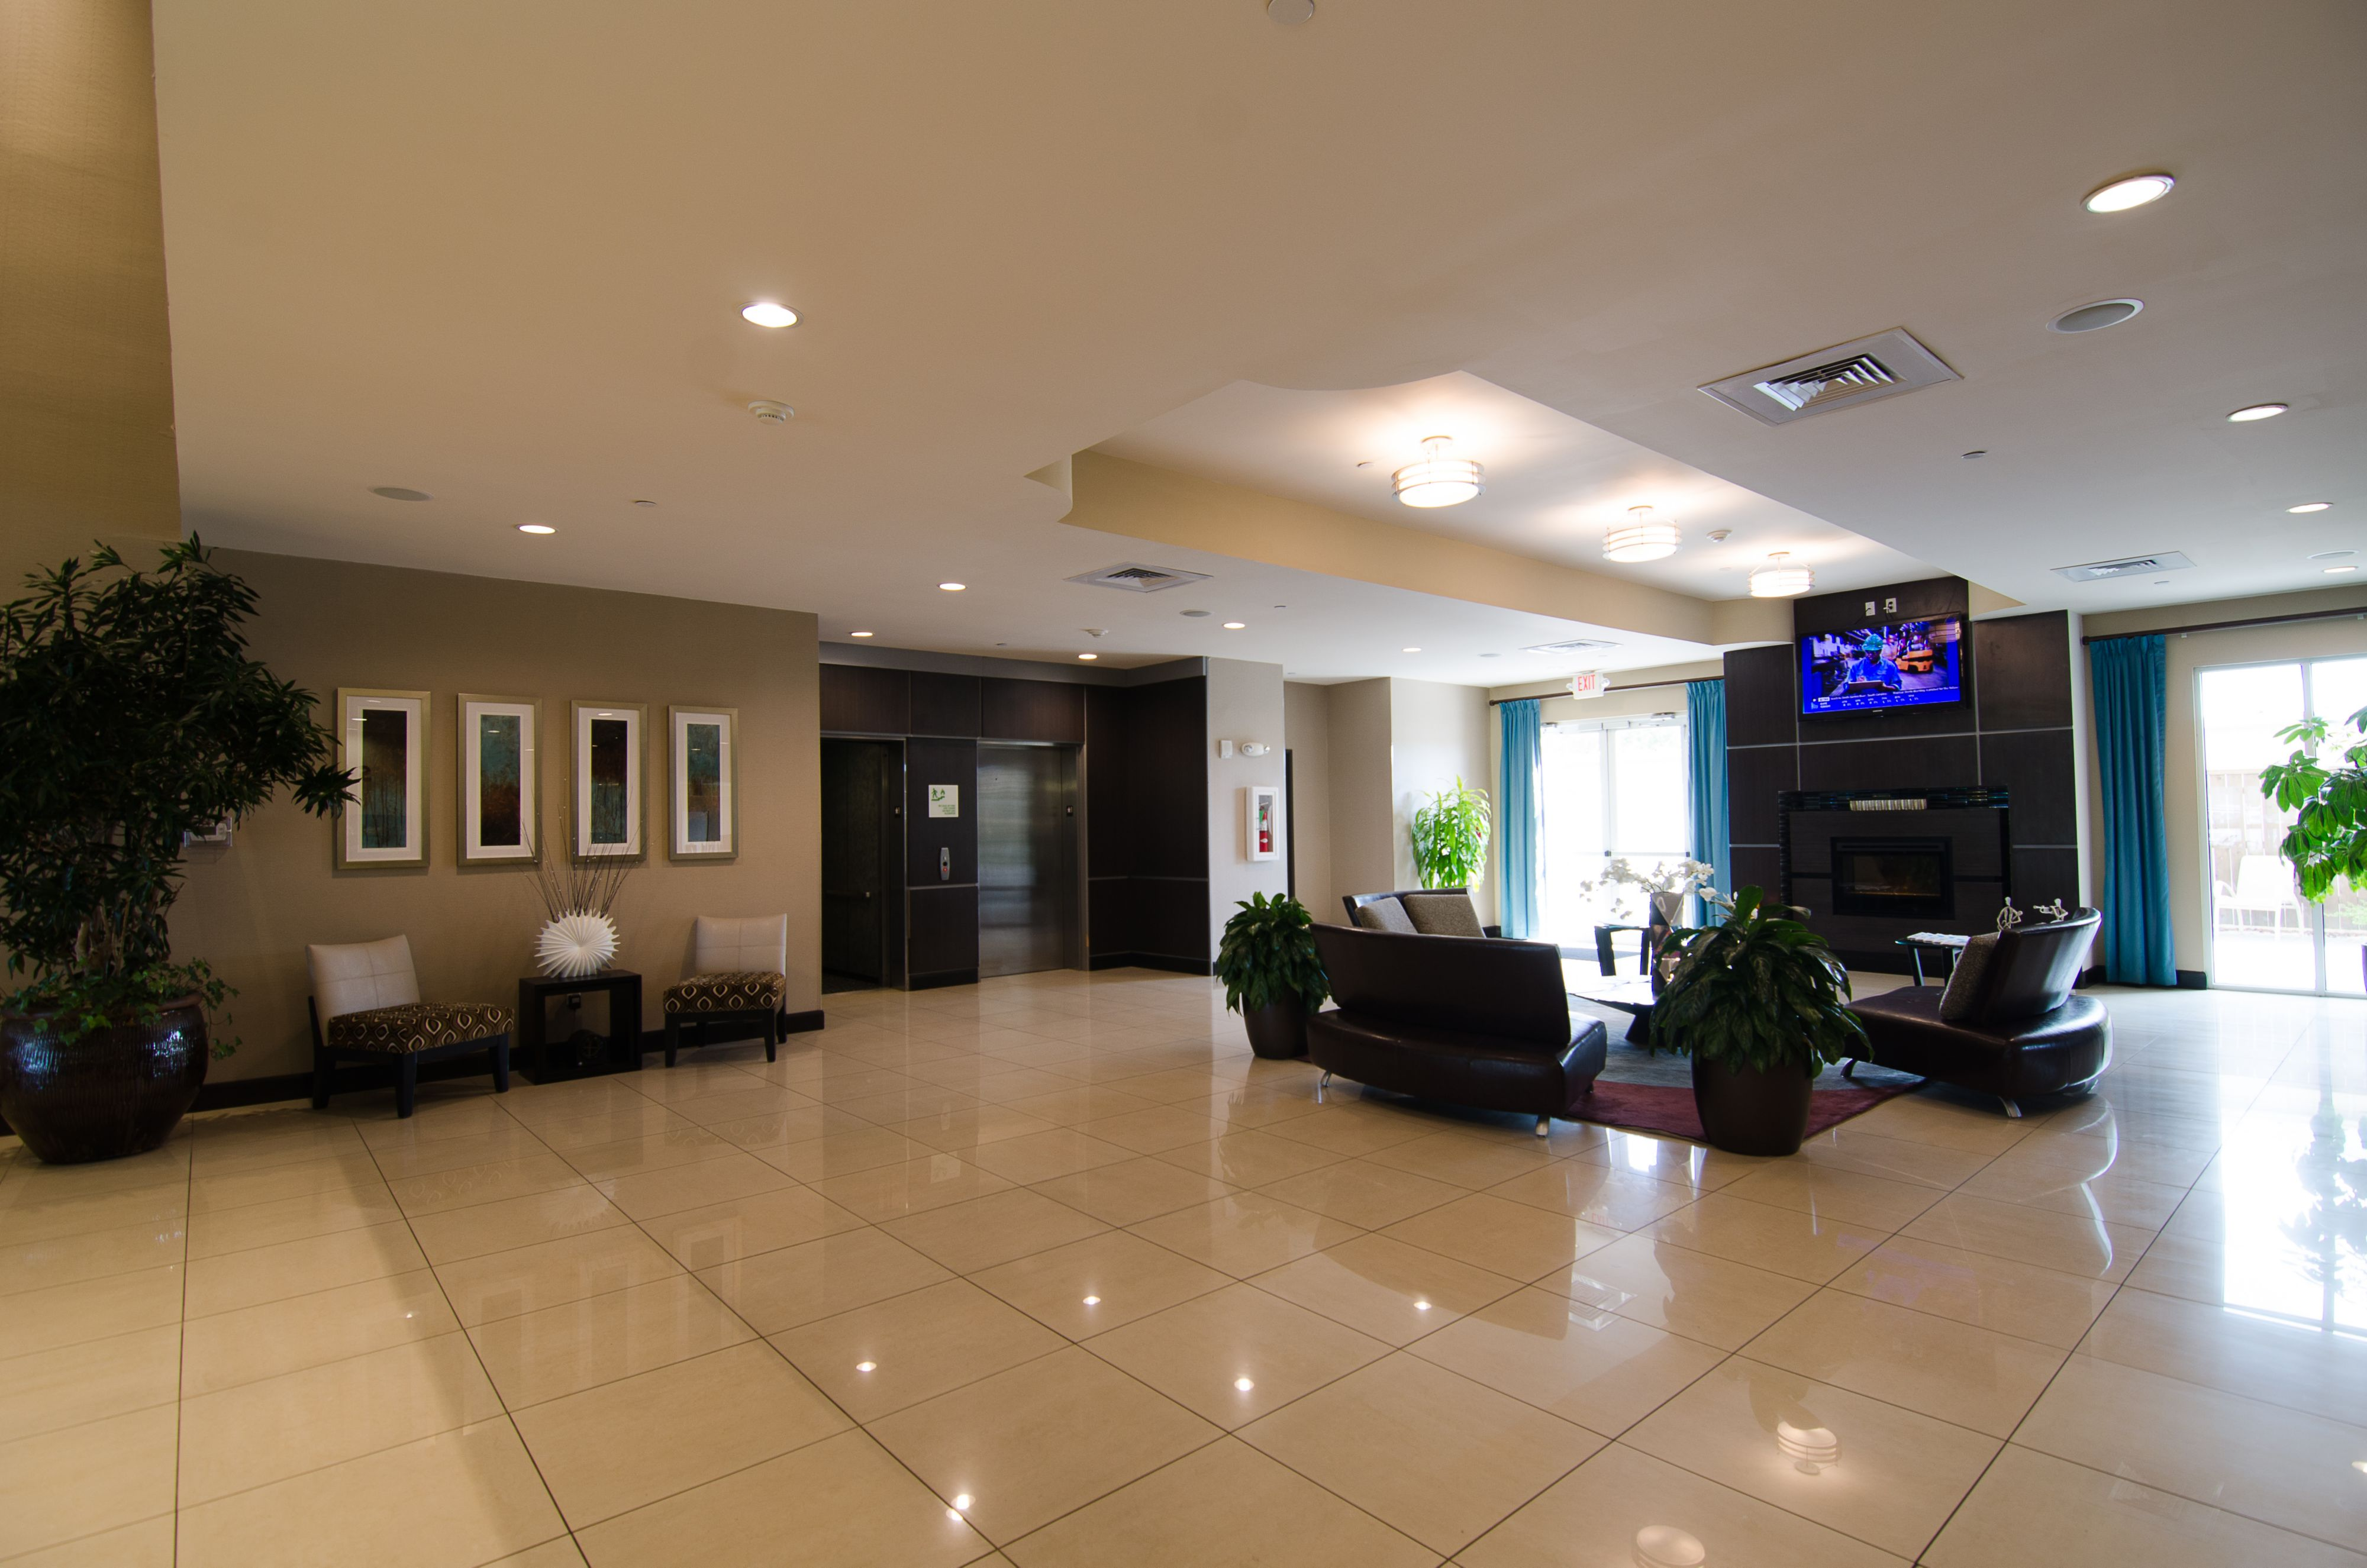 Hotels In Hammond La Near I